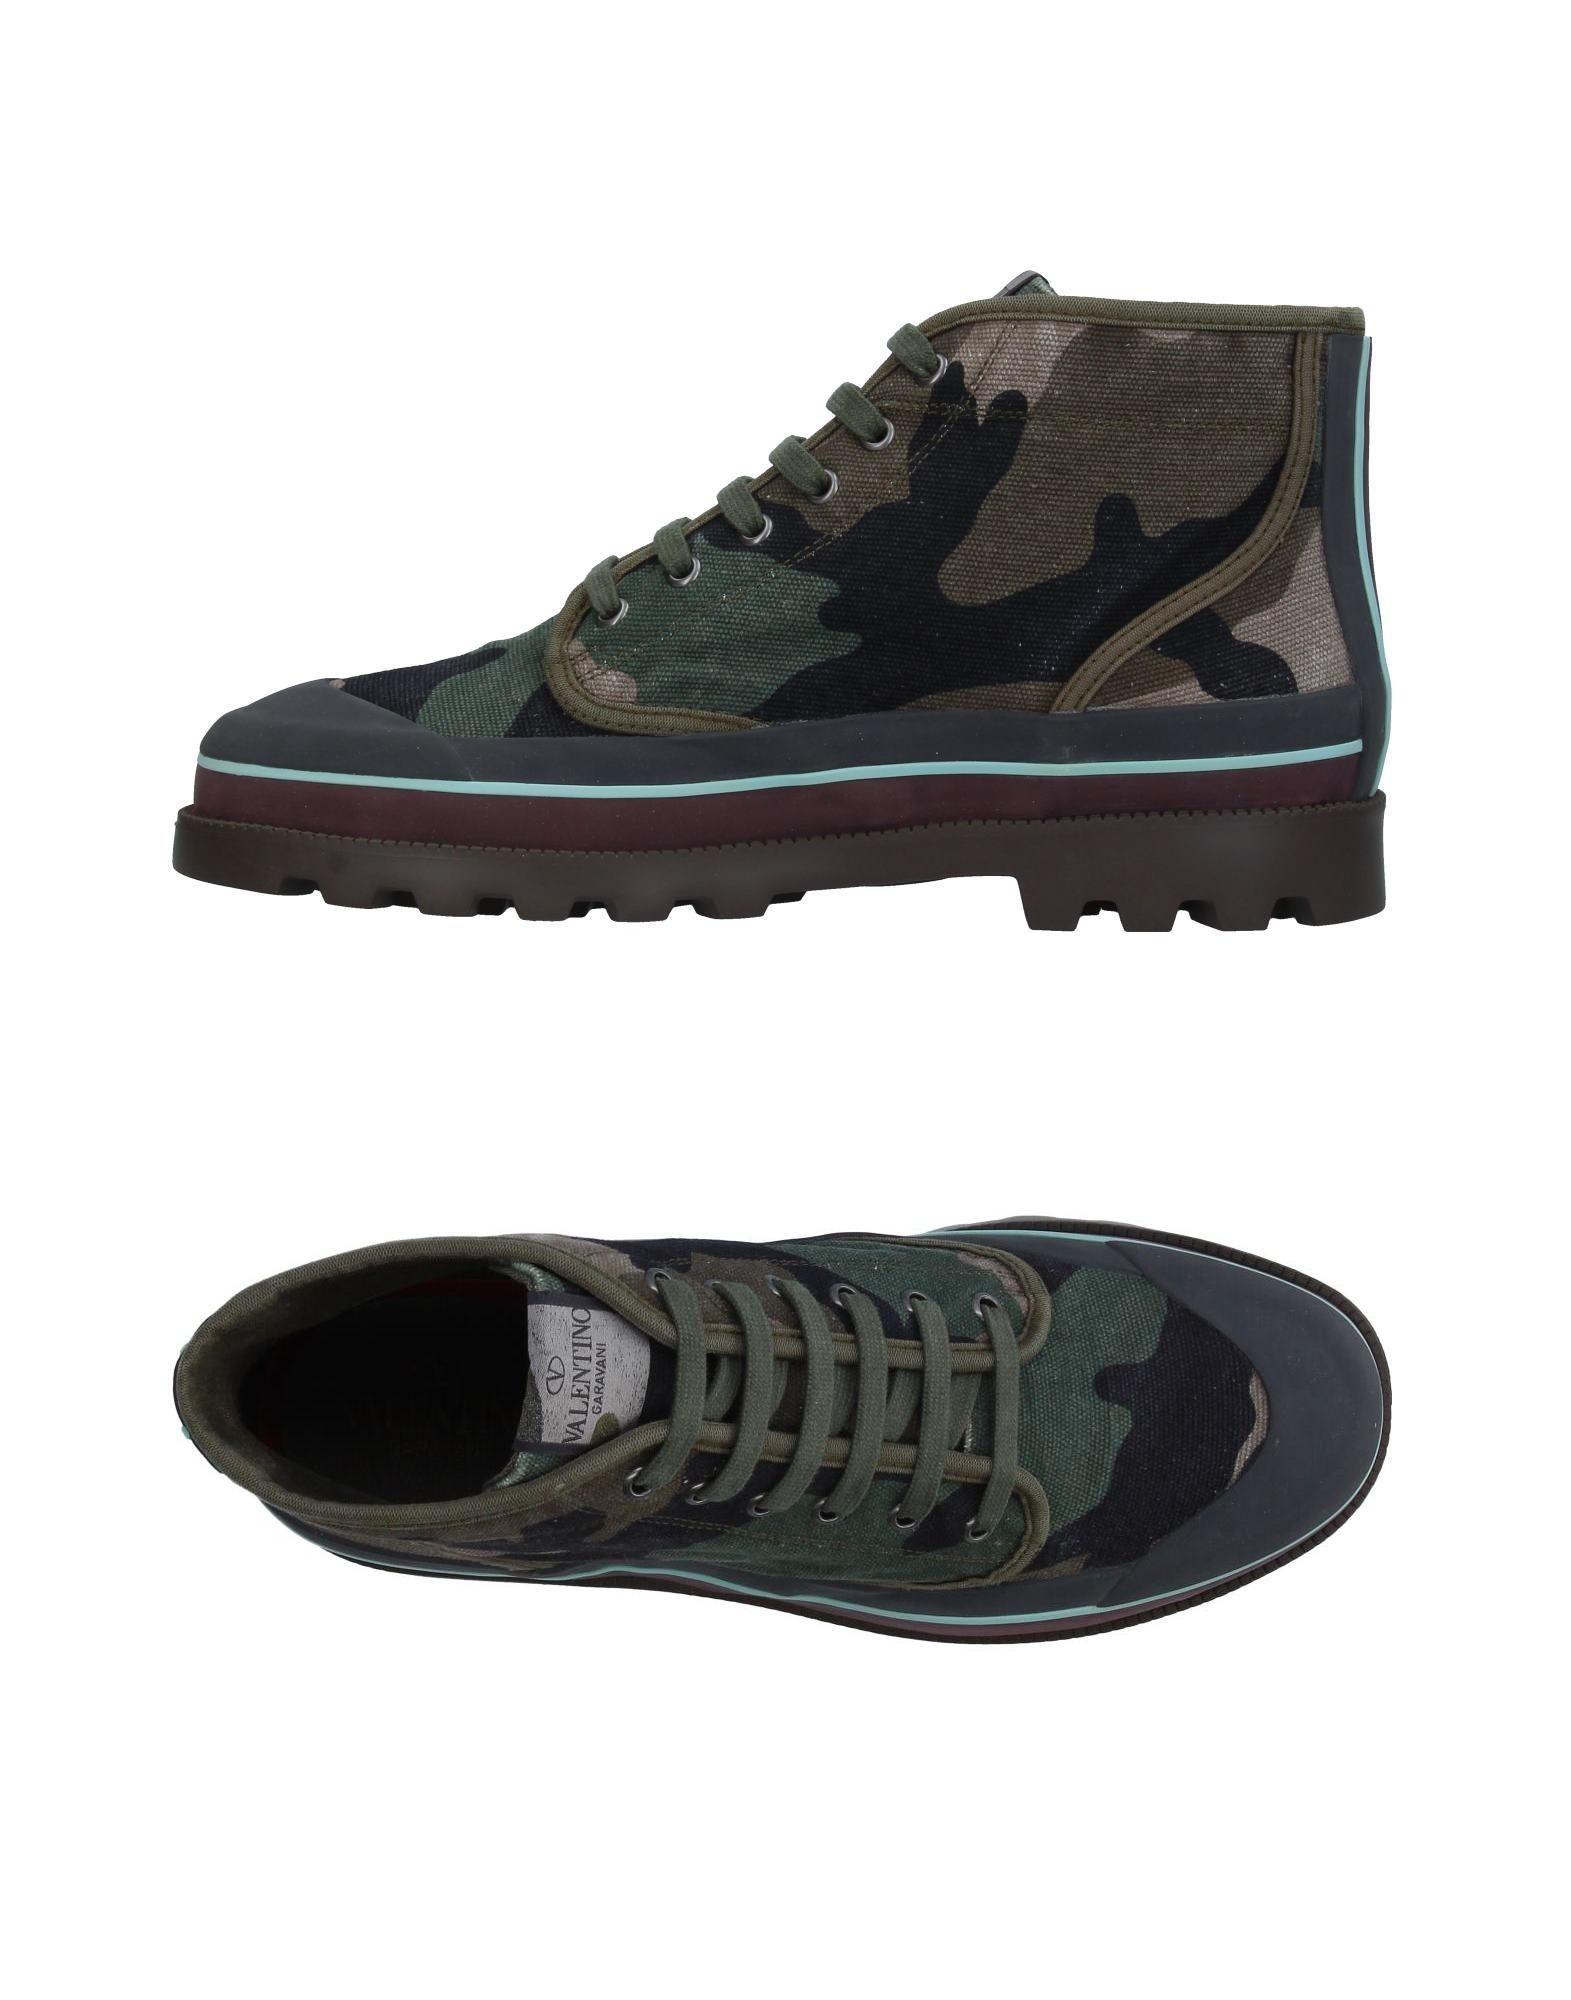 Sneakers Valentino Garavani Homme - Sneakers Valentino Garavani sur